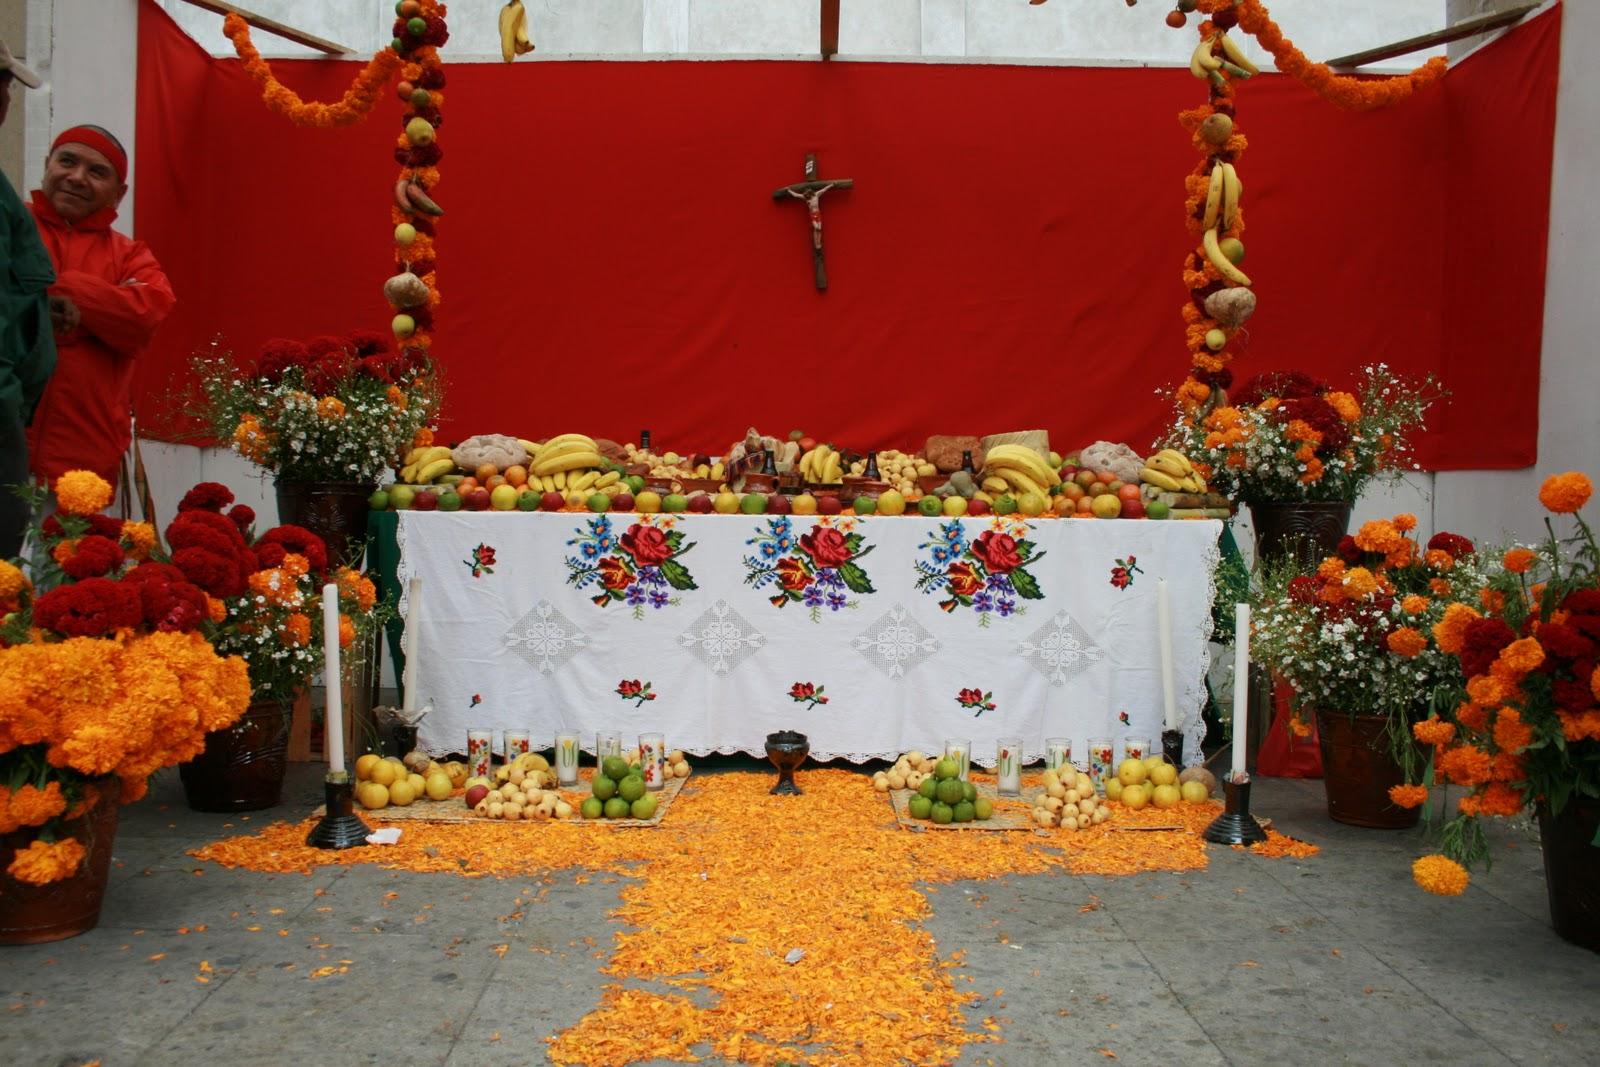 CULTURA TOLUCA Ofrendas del CEDIPIEM en la Gonzlez Arratia